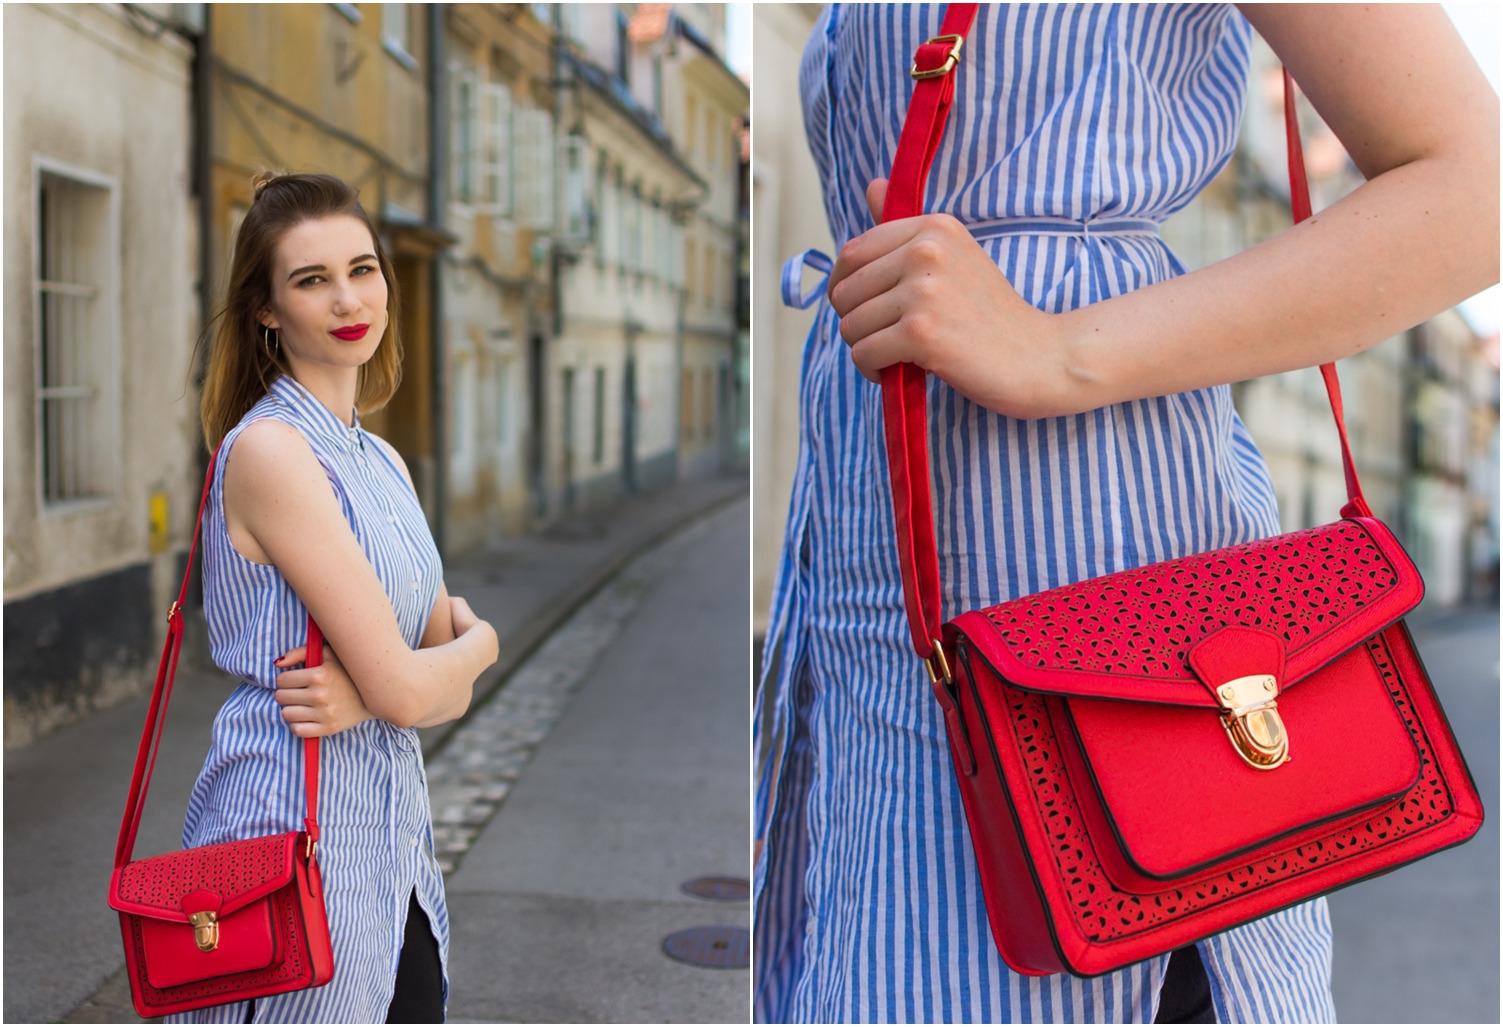 Zalabell_fashion_summer_blue_shirt_red_bag_4